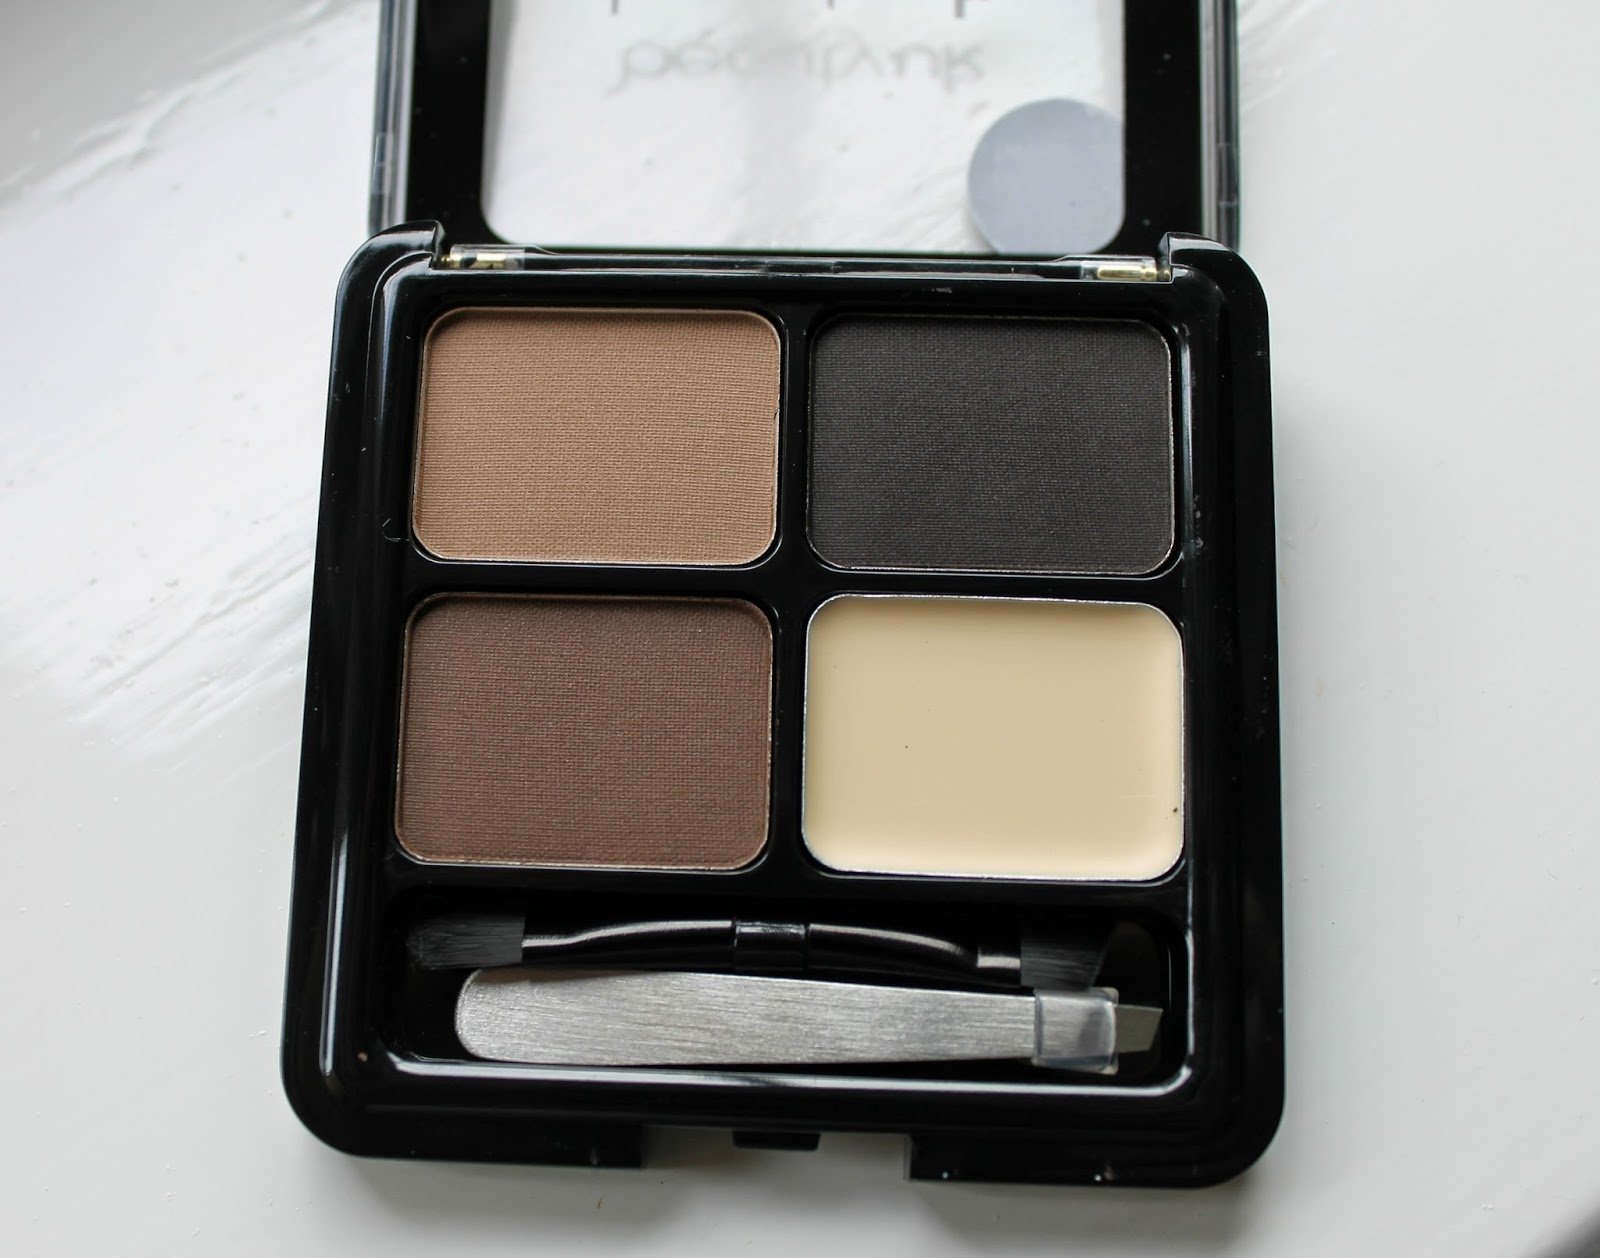 Love Me Beauty Box June 2014 BeautyUK Eyebrow Kit